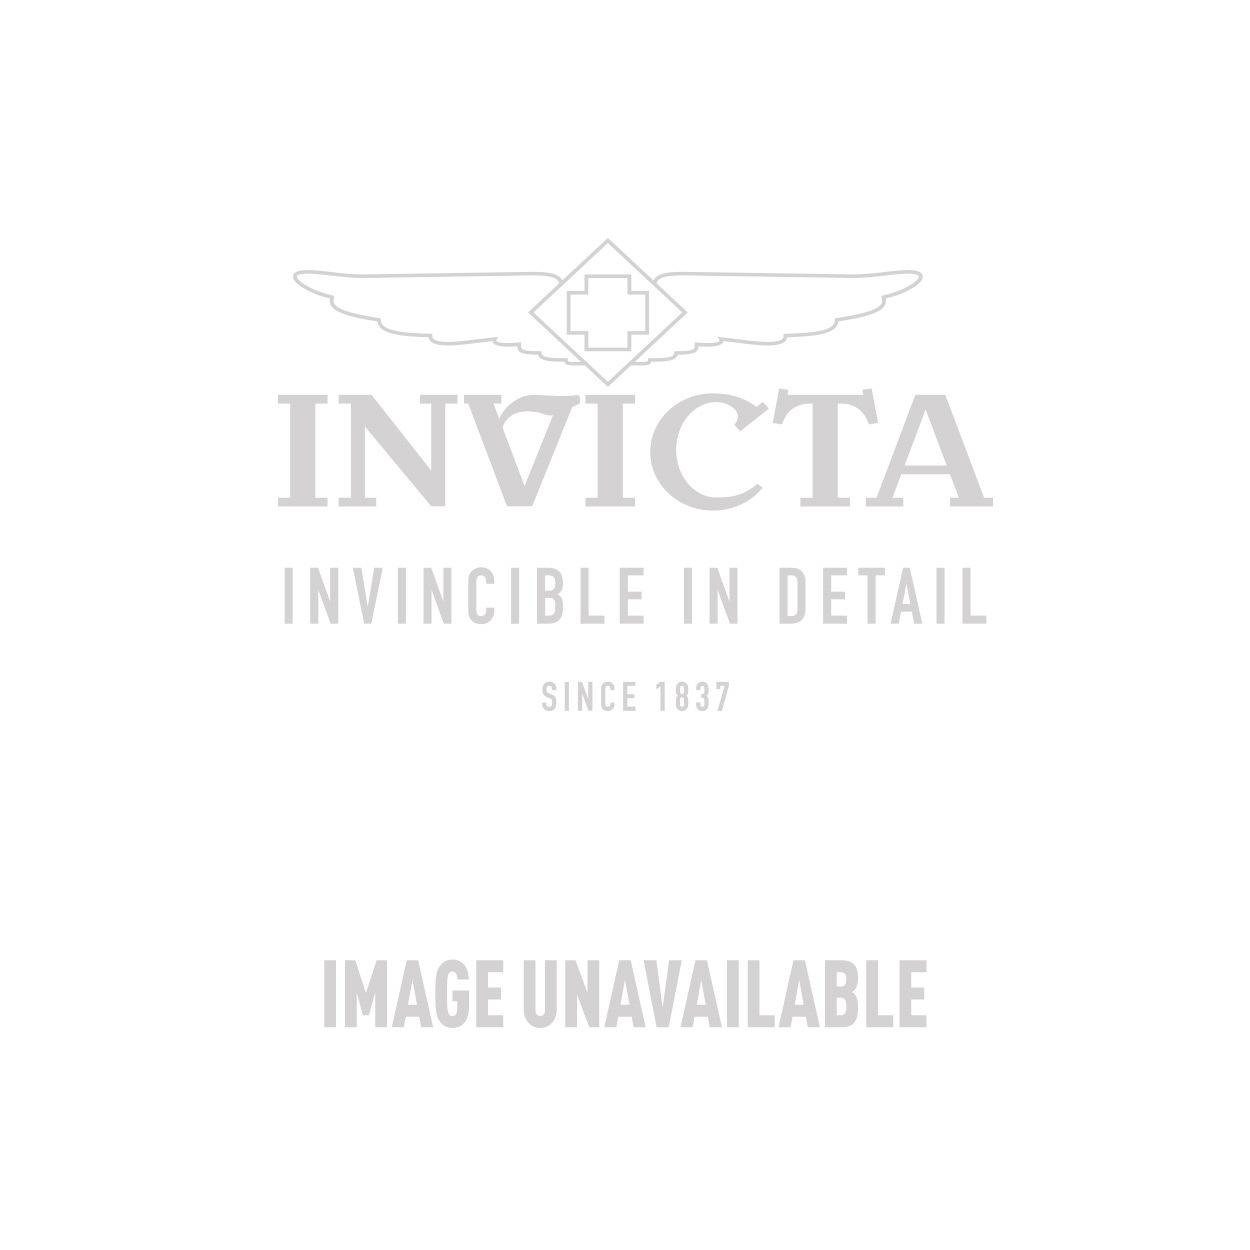 fe98ac124 Invicta Pro Diver SCUBA Mens Quartz 50mm Stainless Steel Case Blue Dial -  Model 25855 - Official Invicta Store